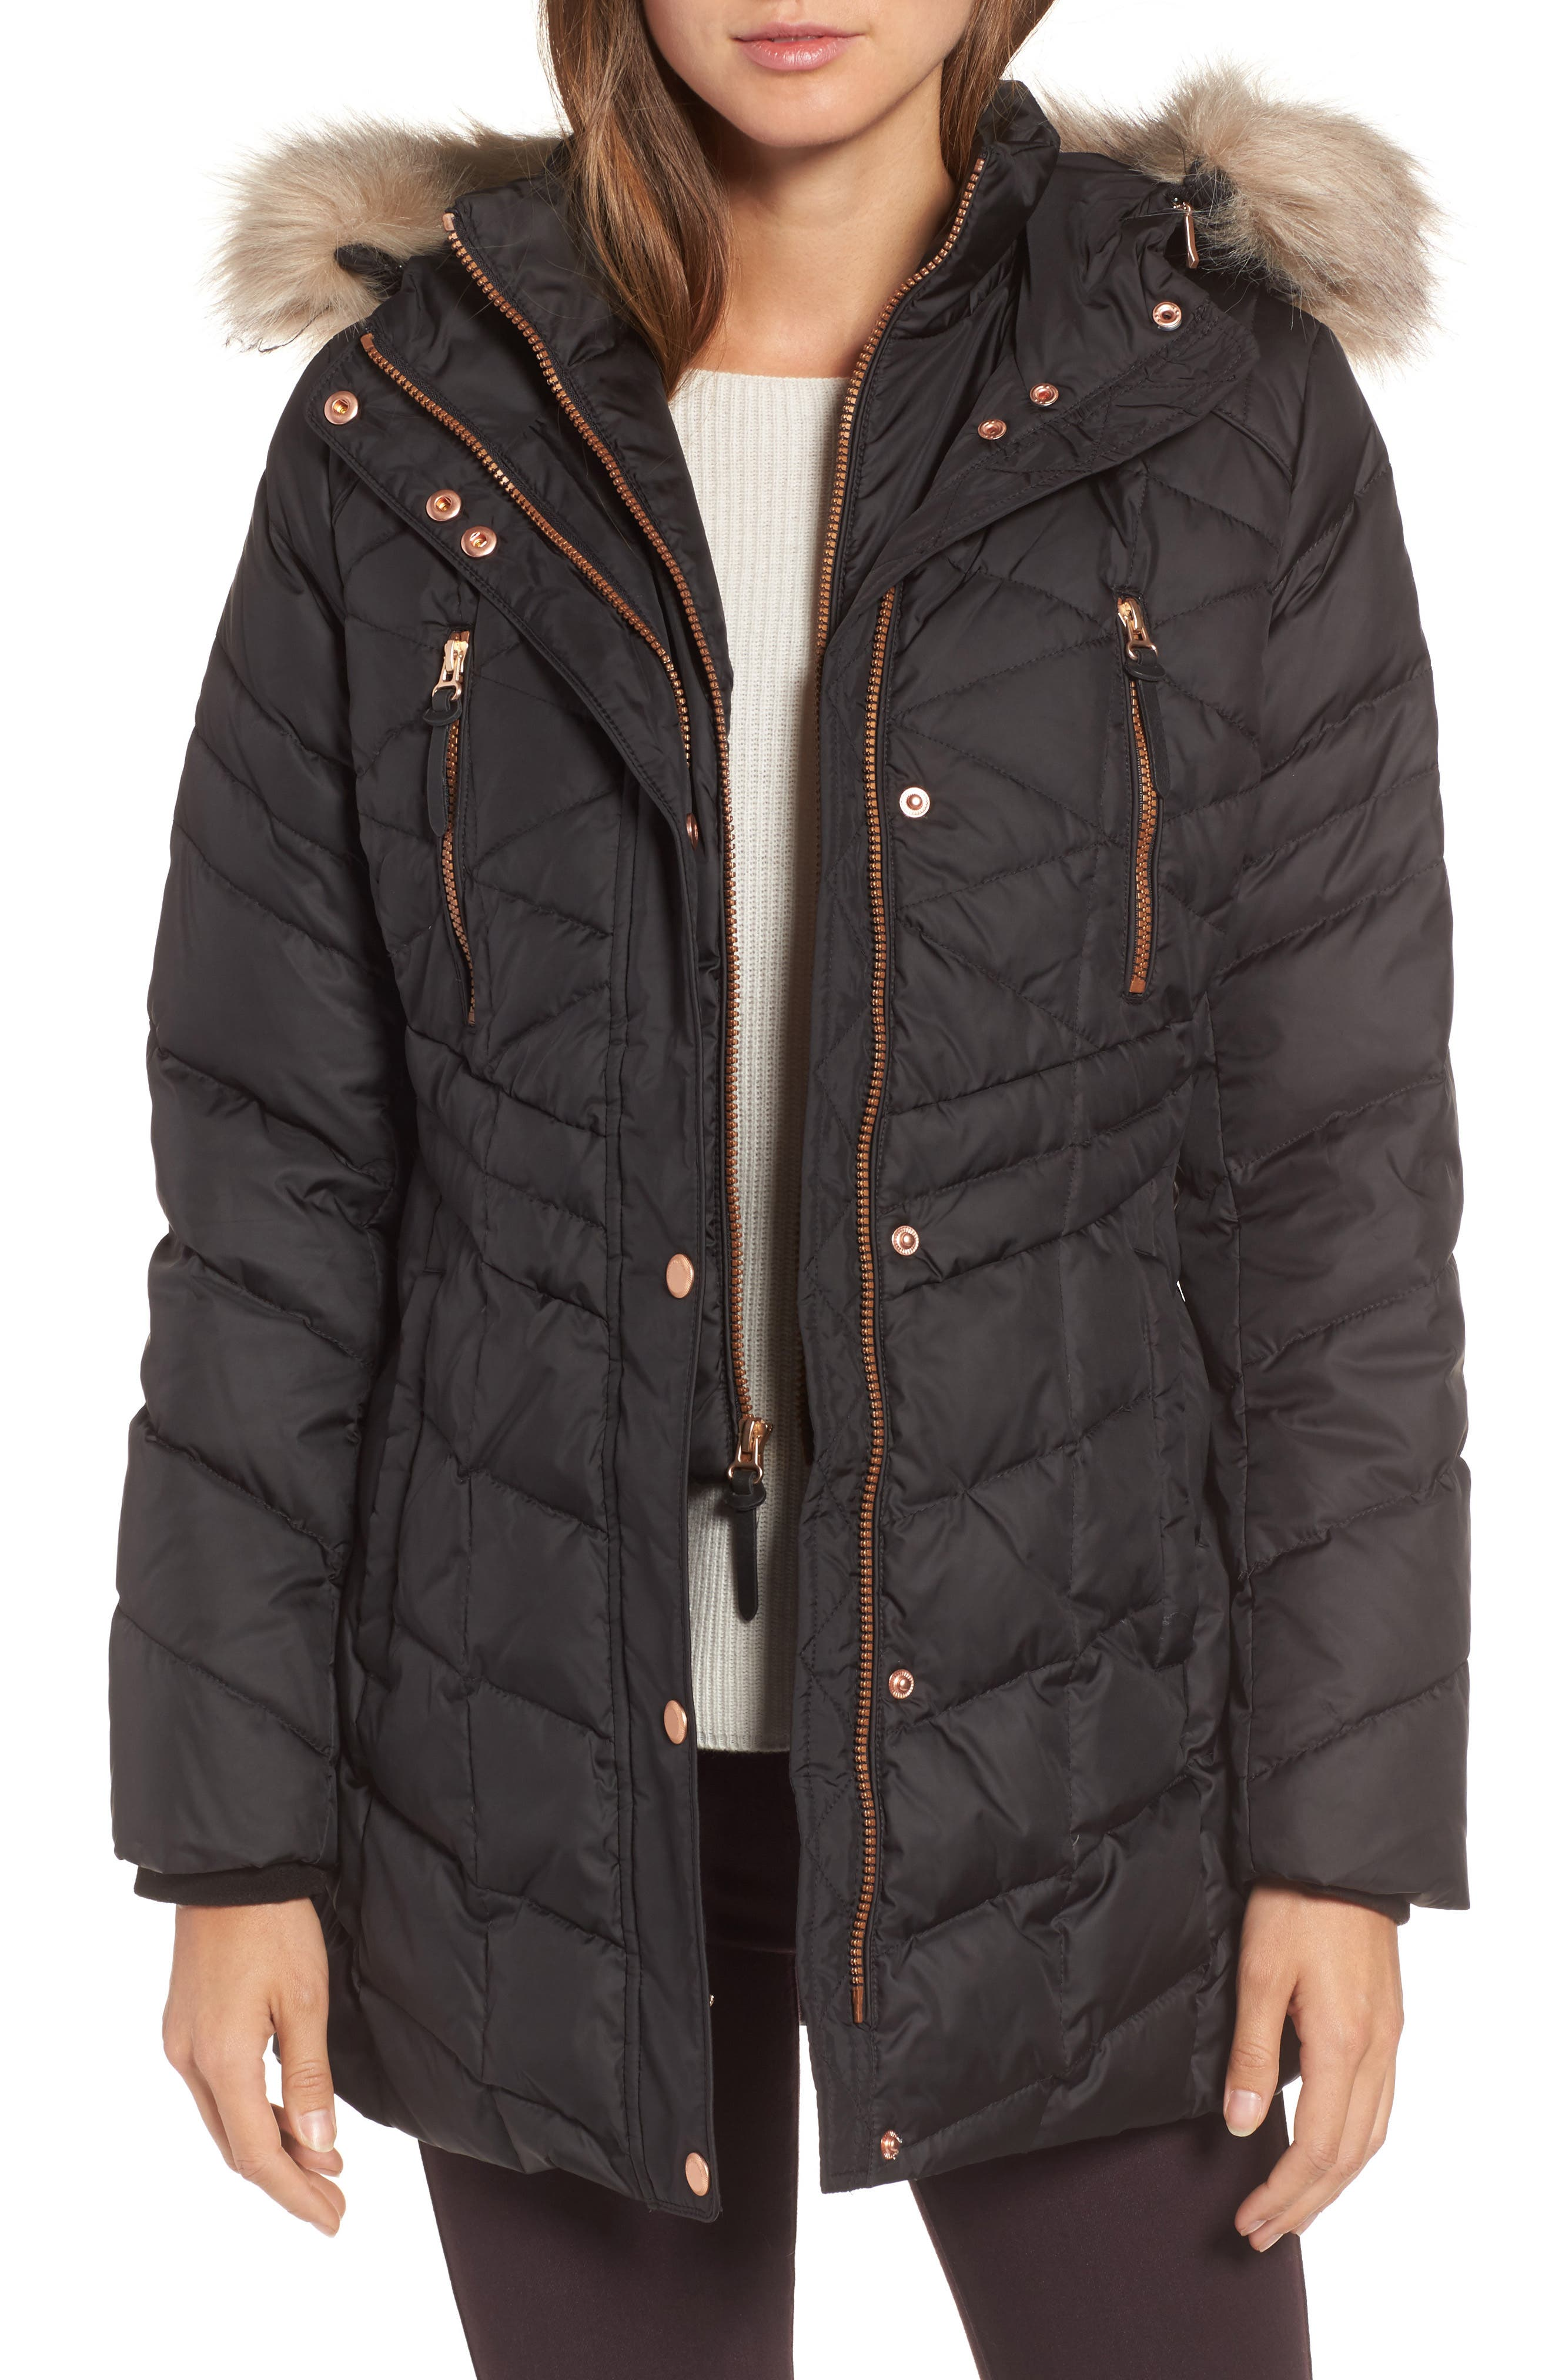 Marley 30 Coat with Detachable Faux Fur,                             Main thumbnail 1, color,                             001